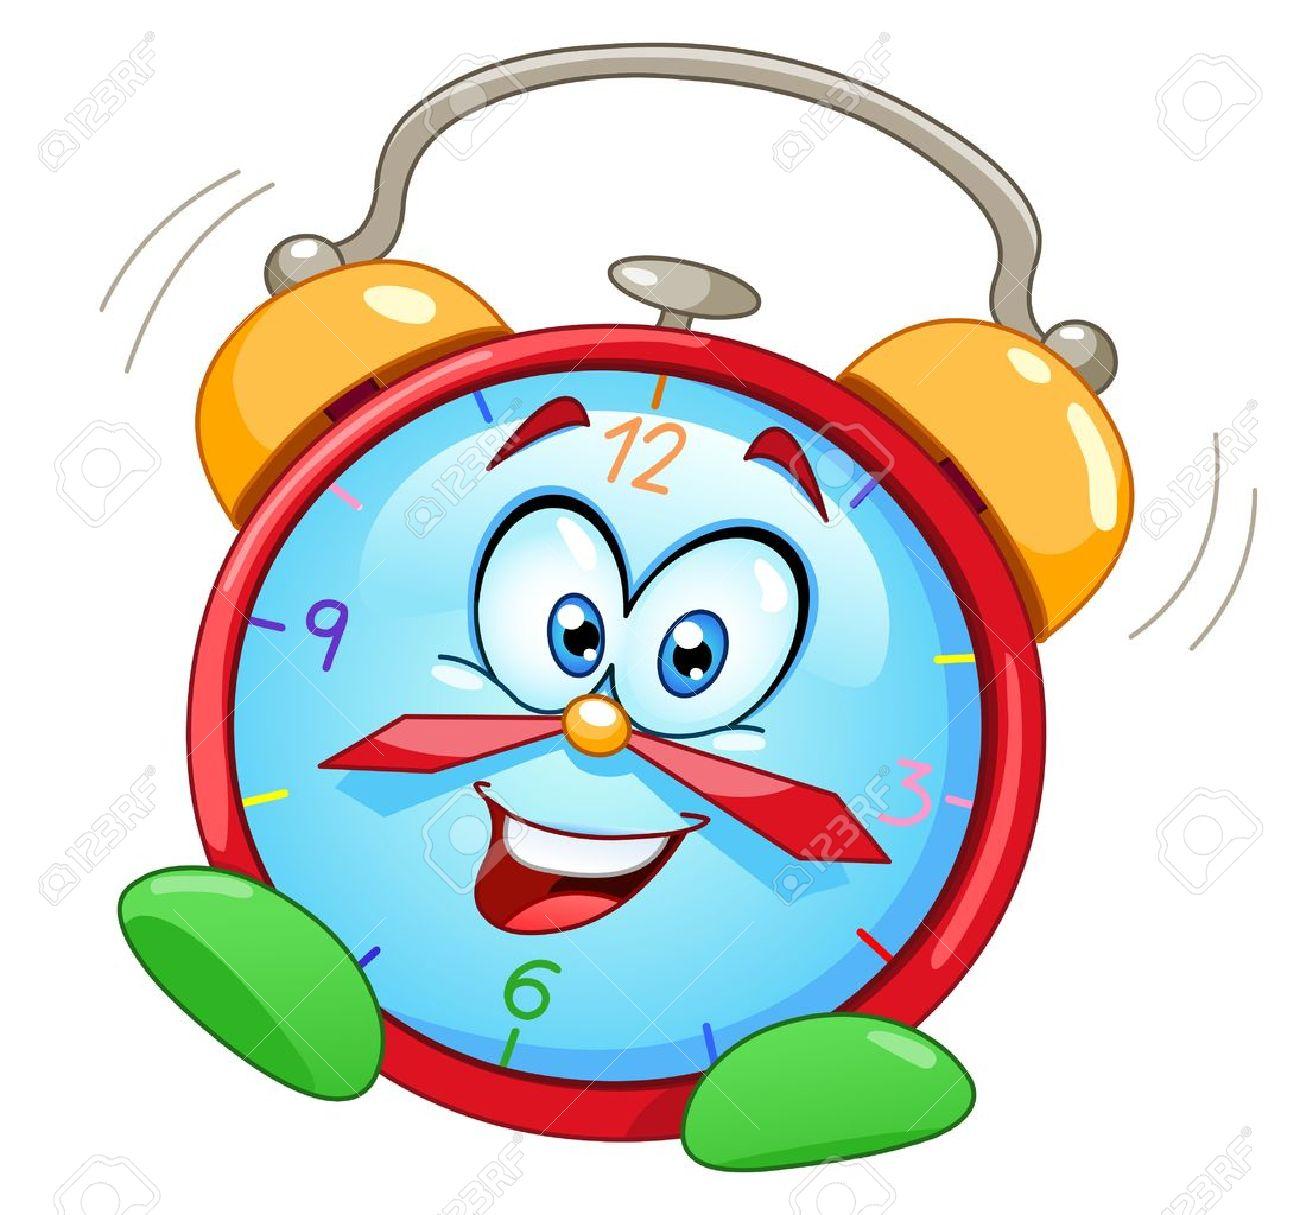 Resultado de imagen de reloj infantil